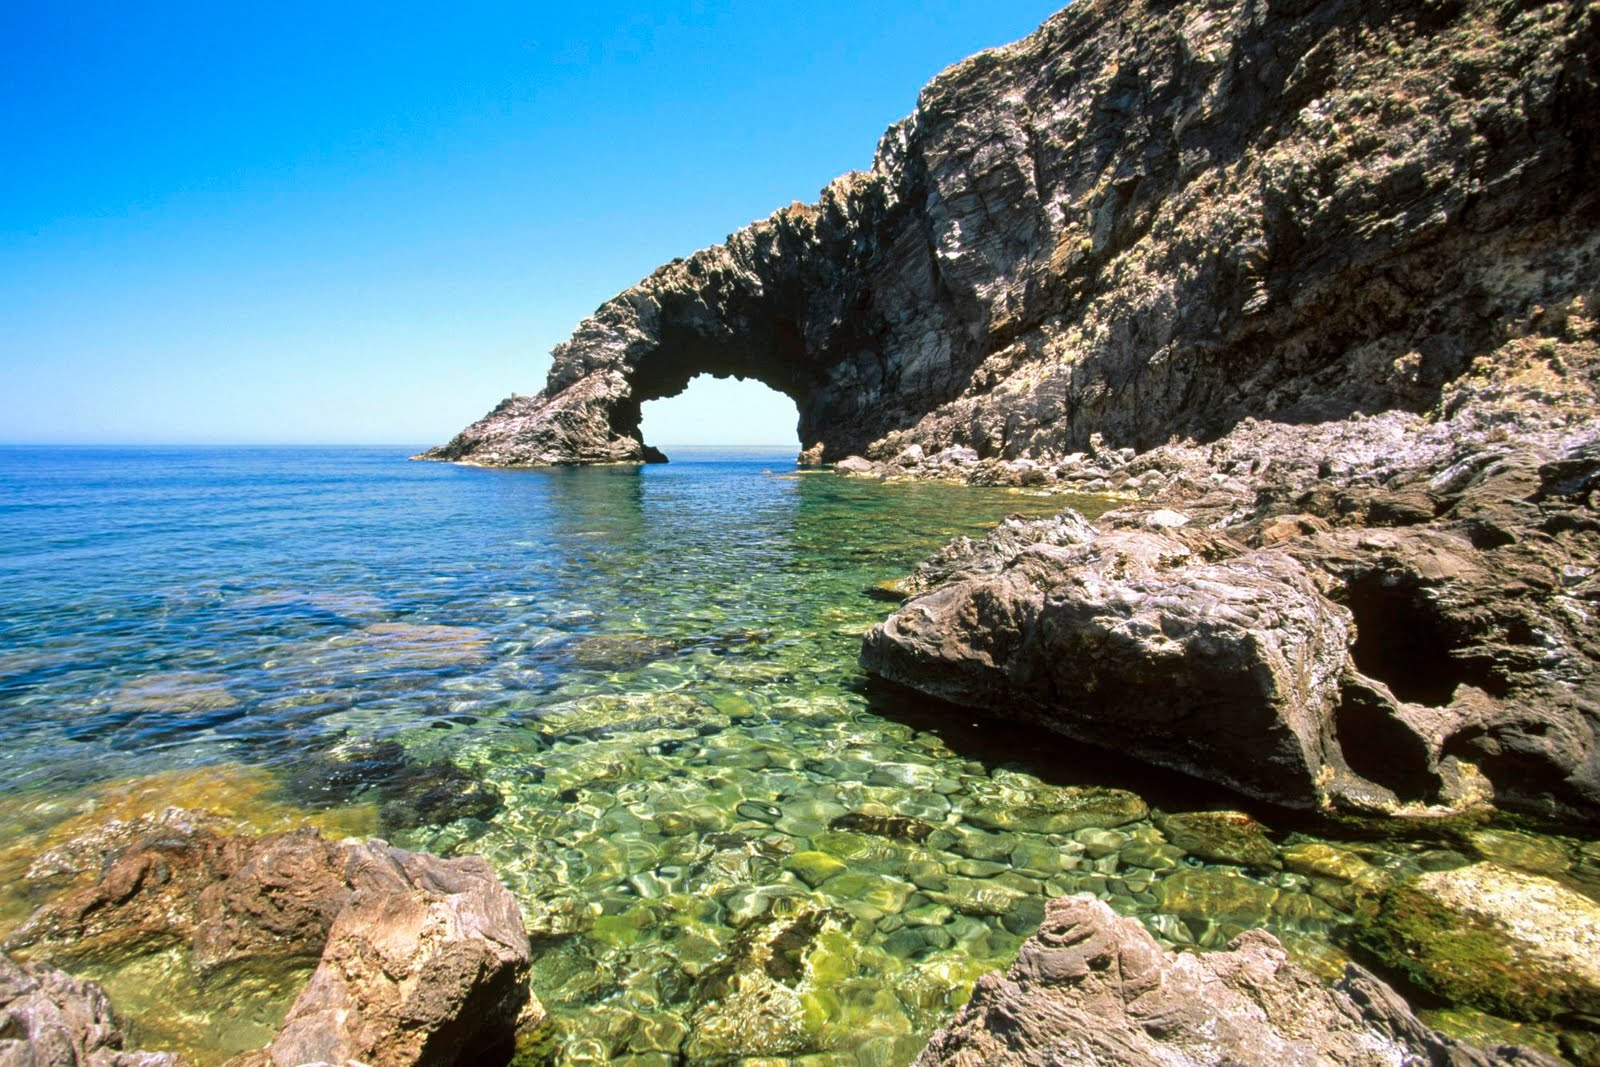 http://4.bp.blogspot.com/-JqsvKfYZVvM/TX8ie6AHD-I/AAAAAAAAEgE/PVnghib3xXs/s1600/arco_delelefante_pantelleria_island_sicily_italy-other.jpg